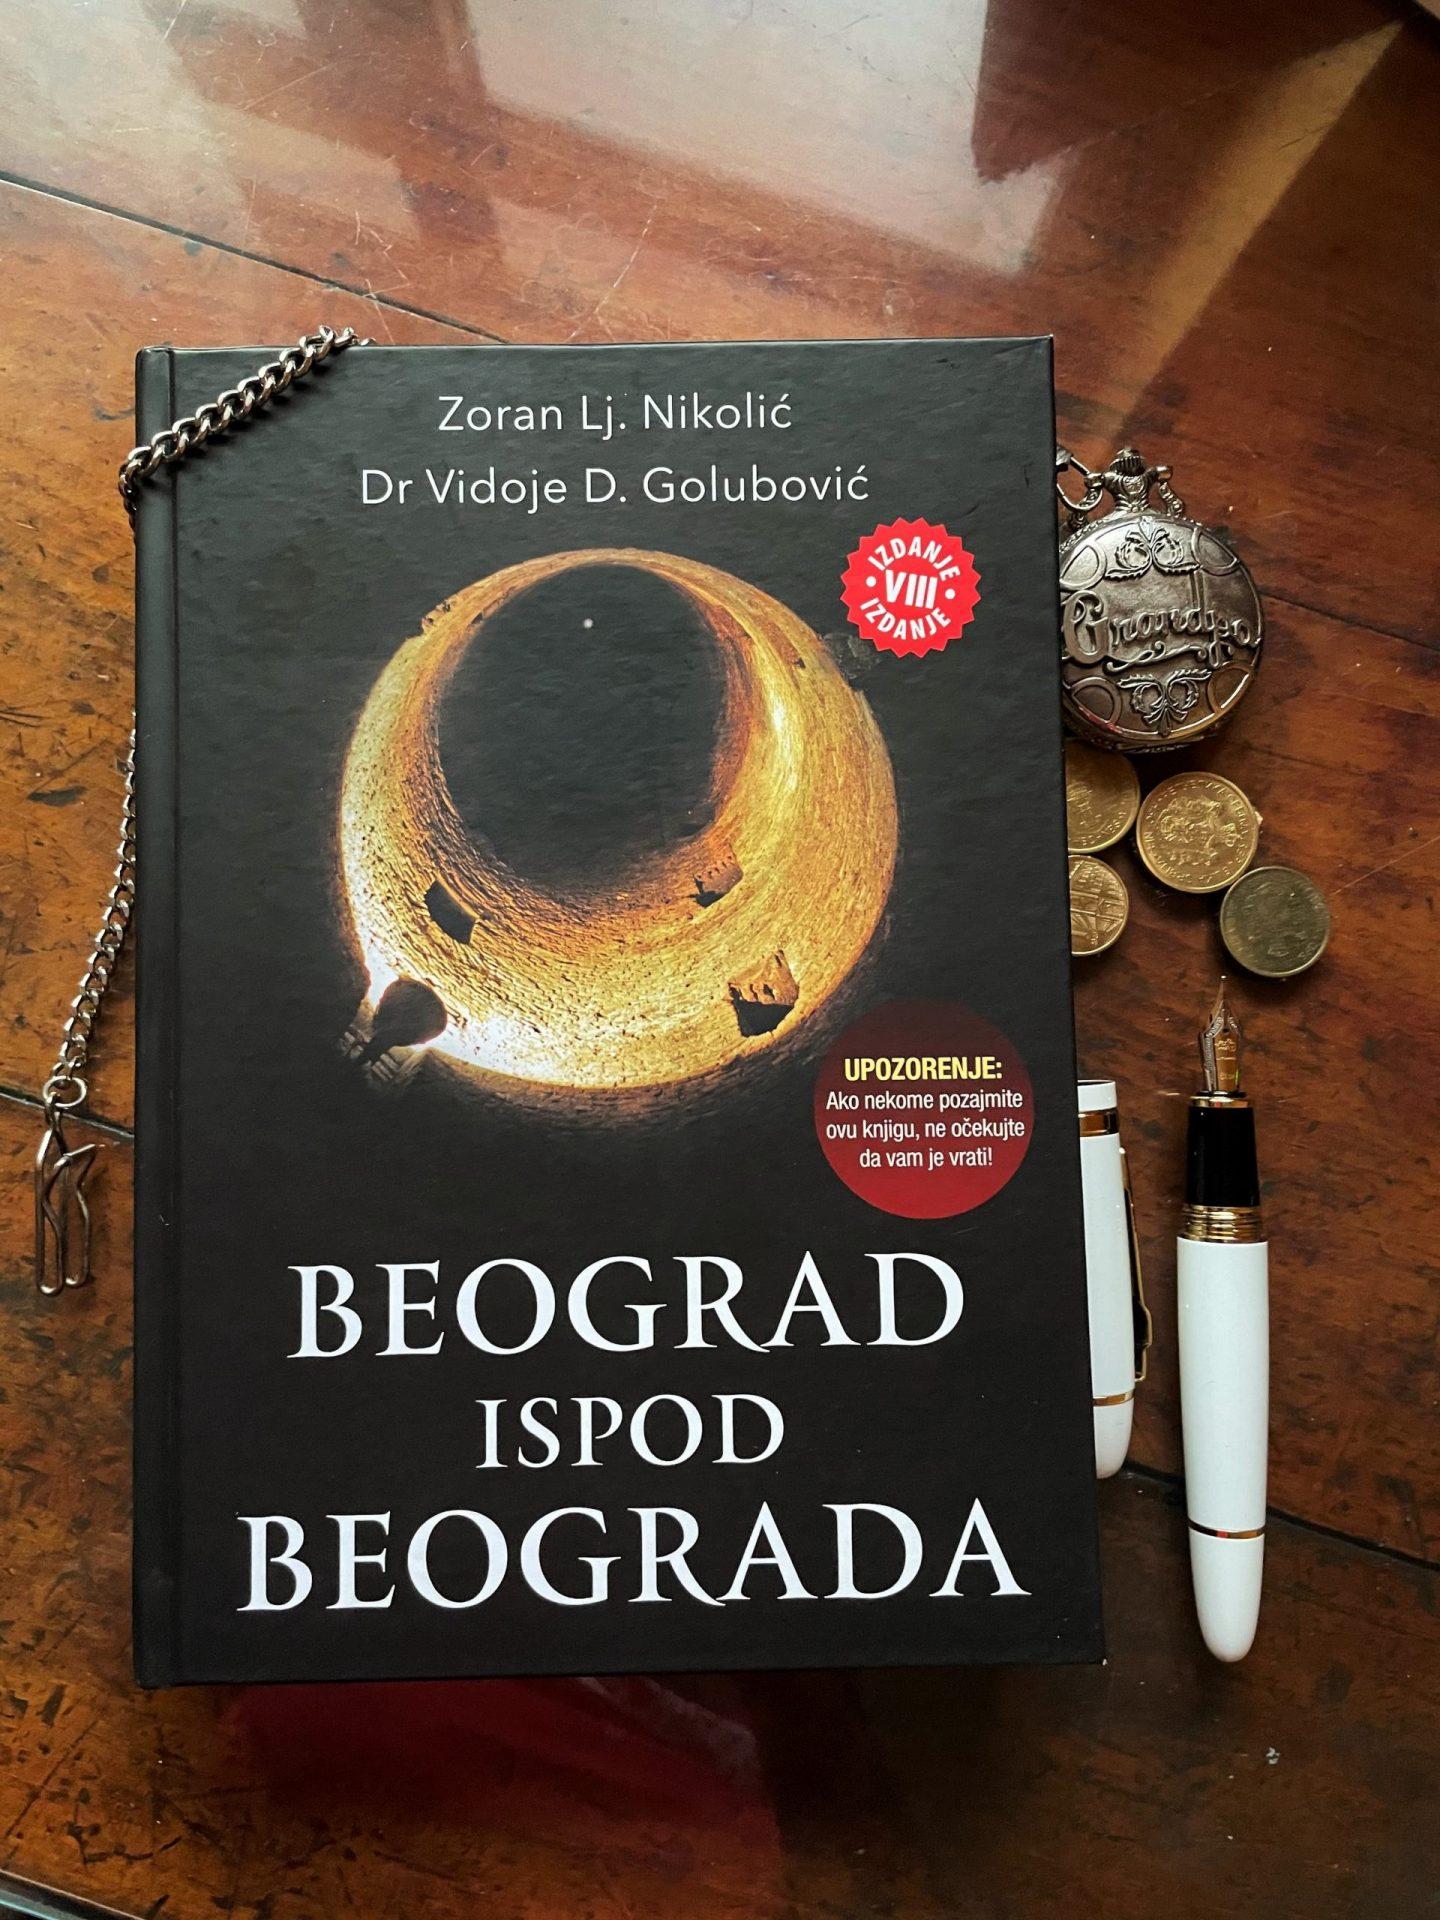 Knjiga Beograd ispod Beograda © According to Kristina